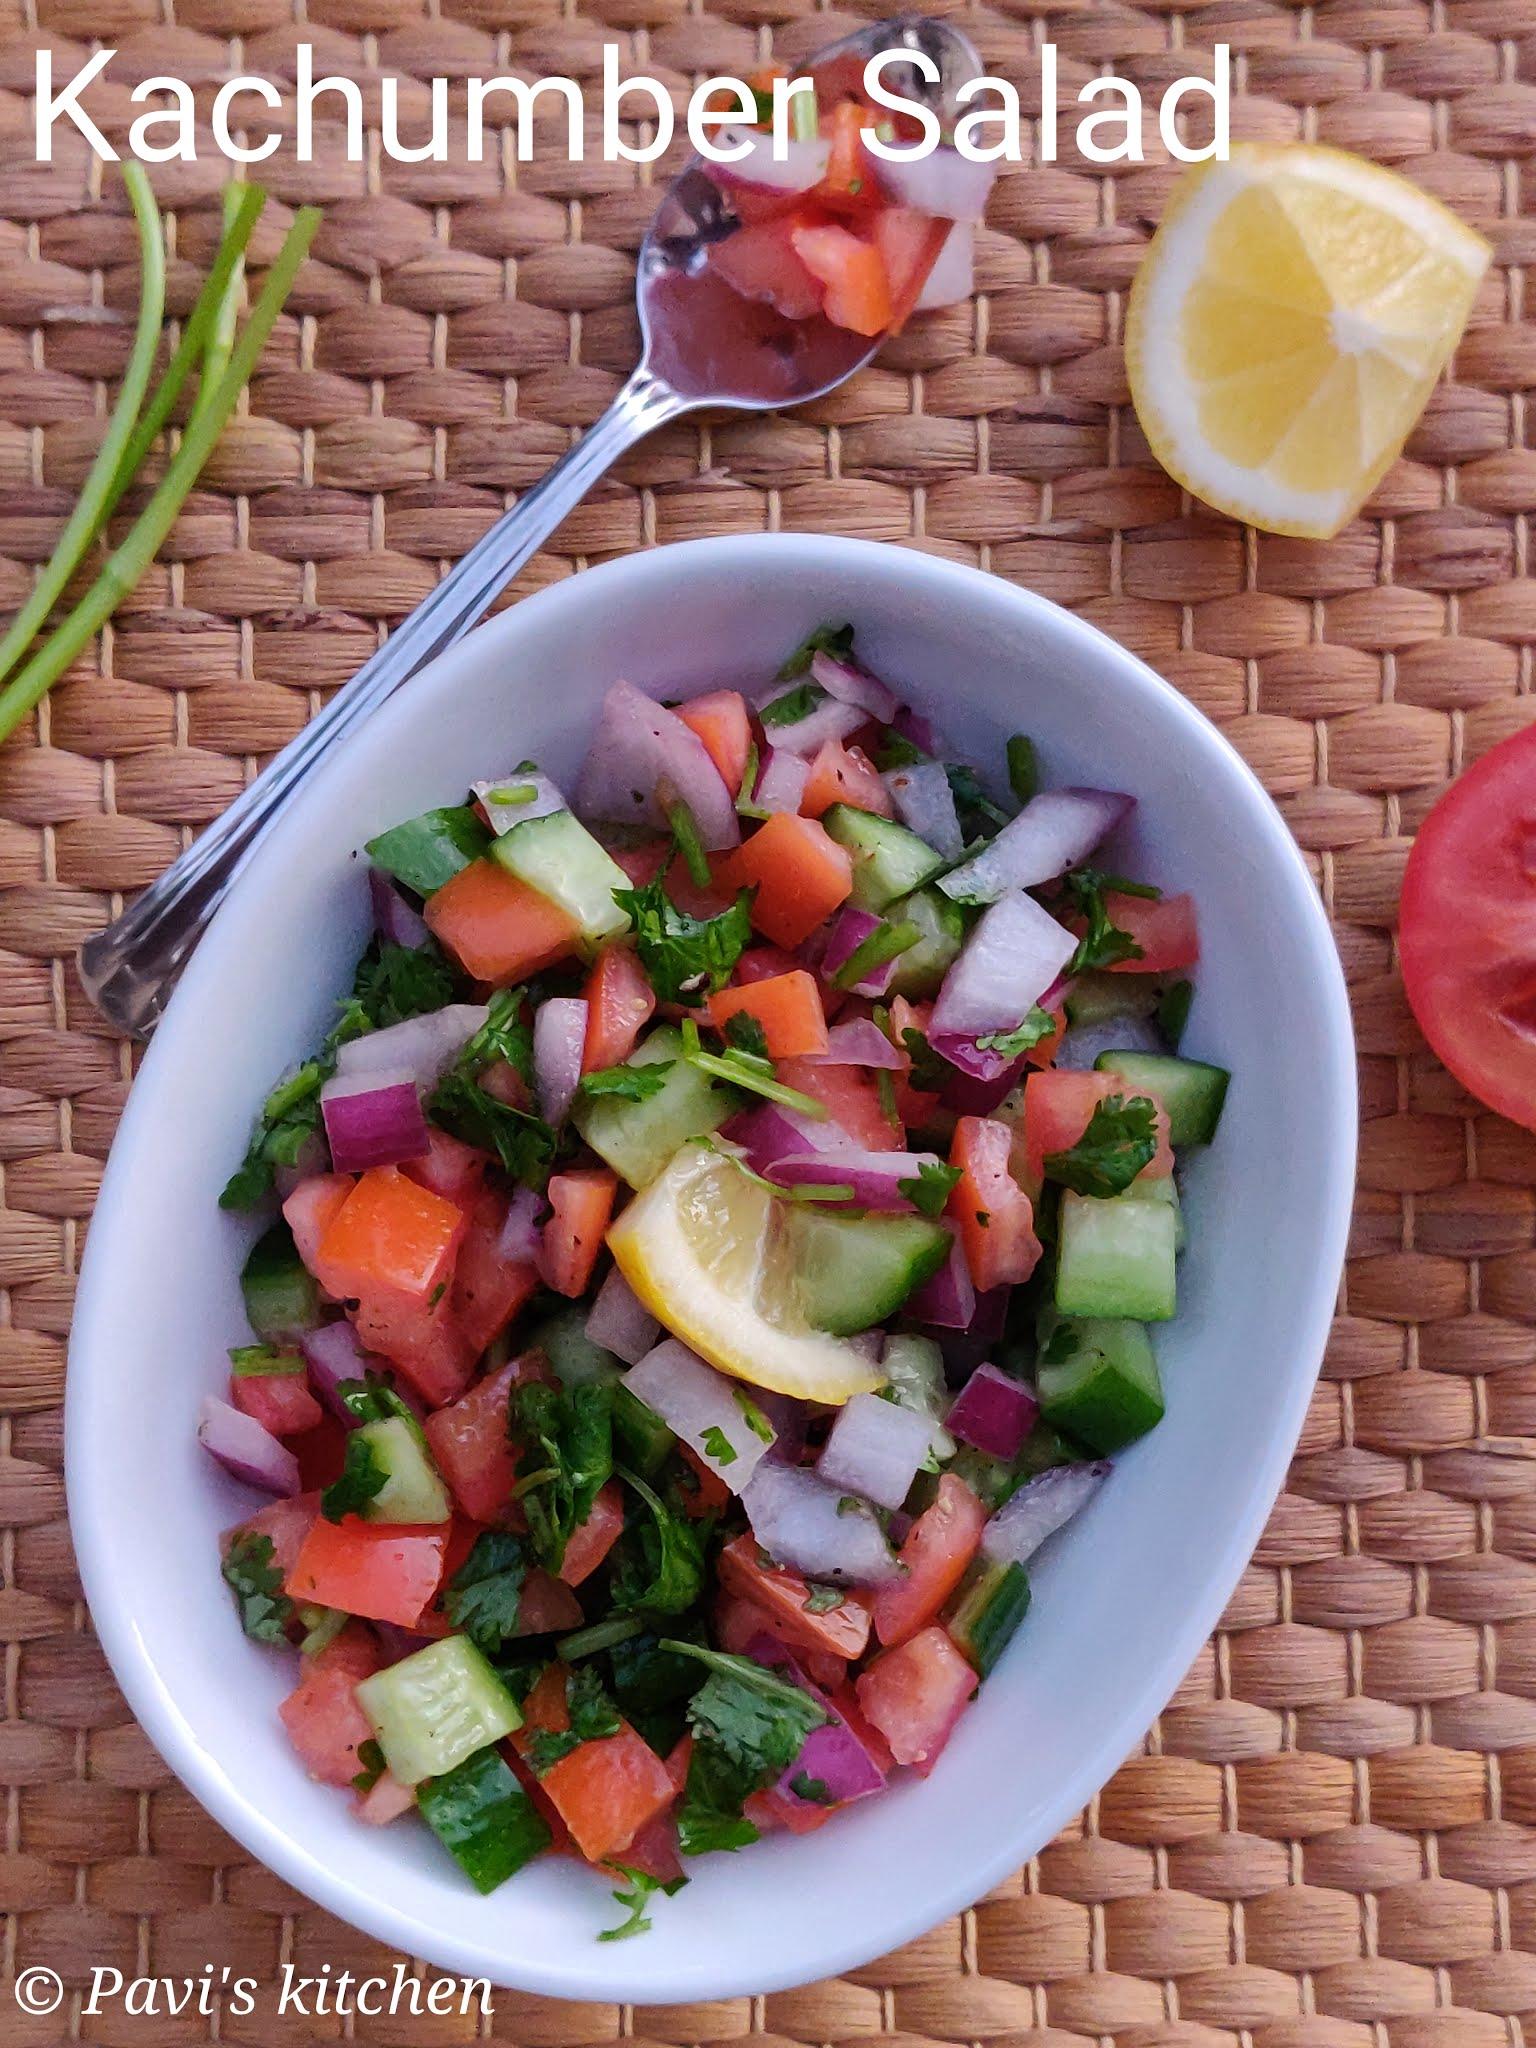 Kachumber (Indian cucumber salad) recipe | easy chopped salad | traditional Indian salad